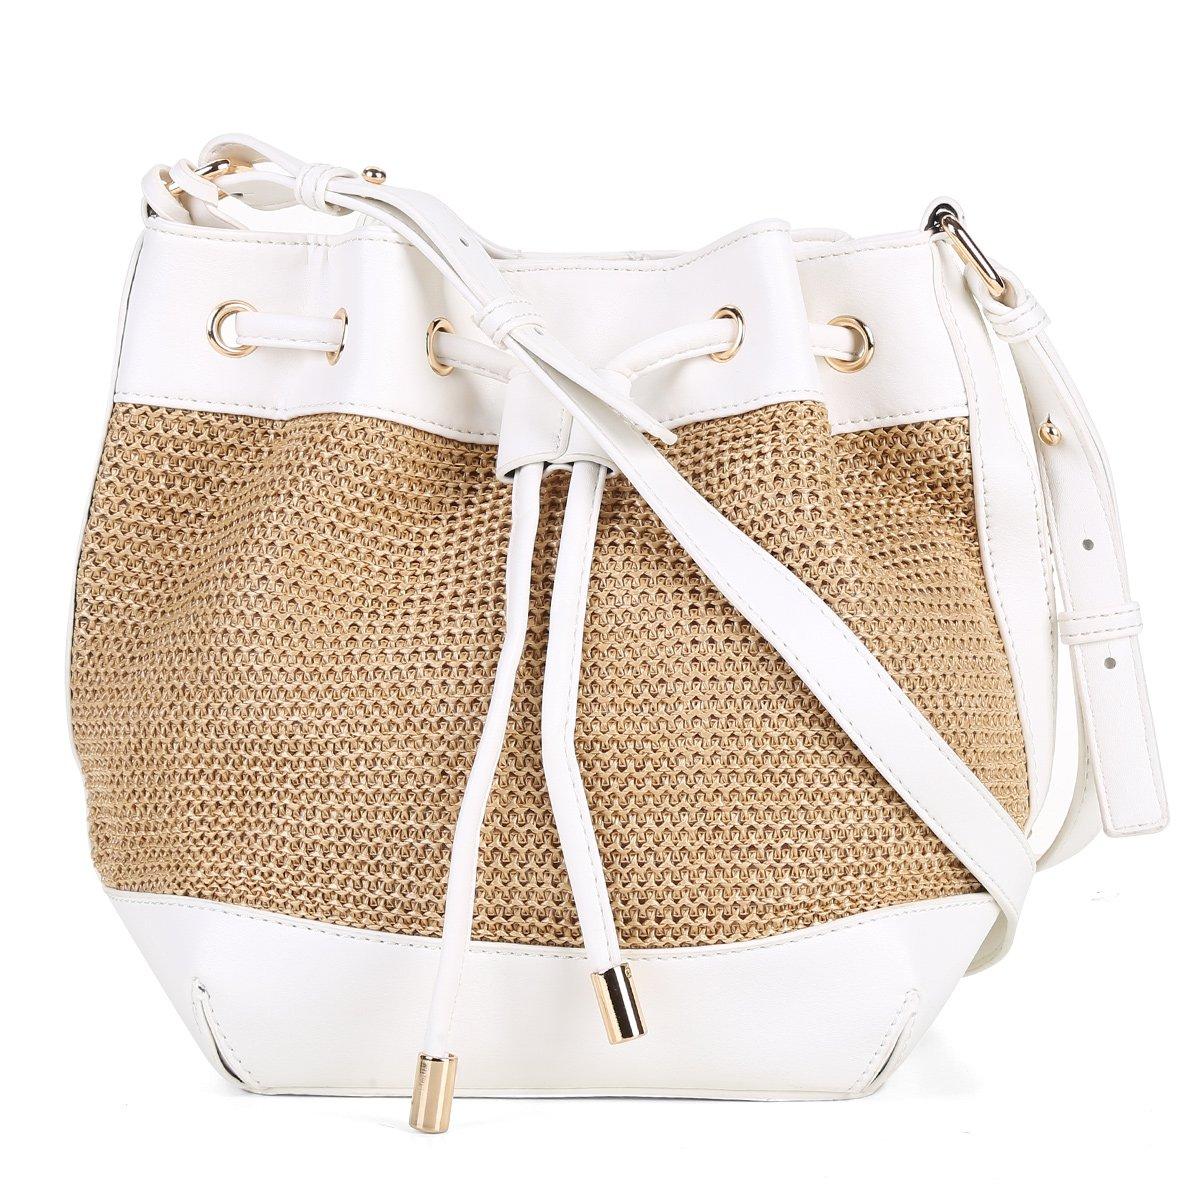 6dbbe2c11 Bolsa Shoestock Bucket Palha Feminina | Shoestock